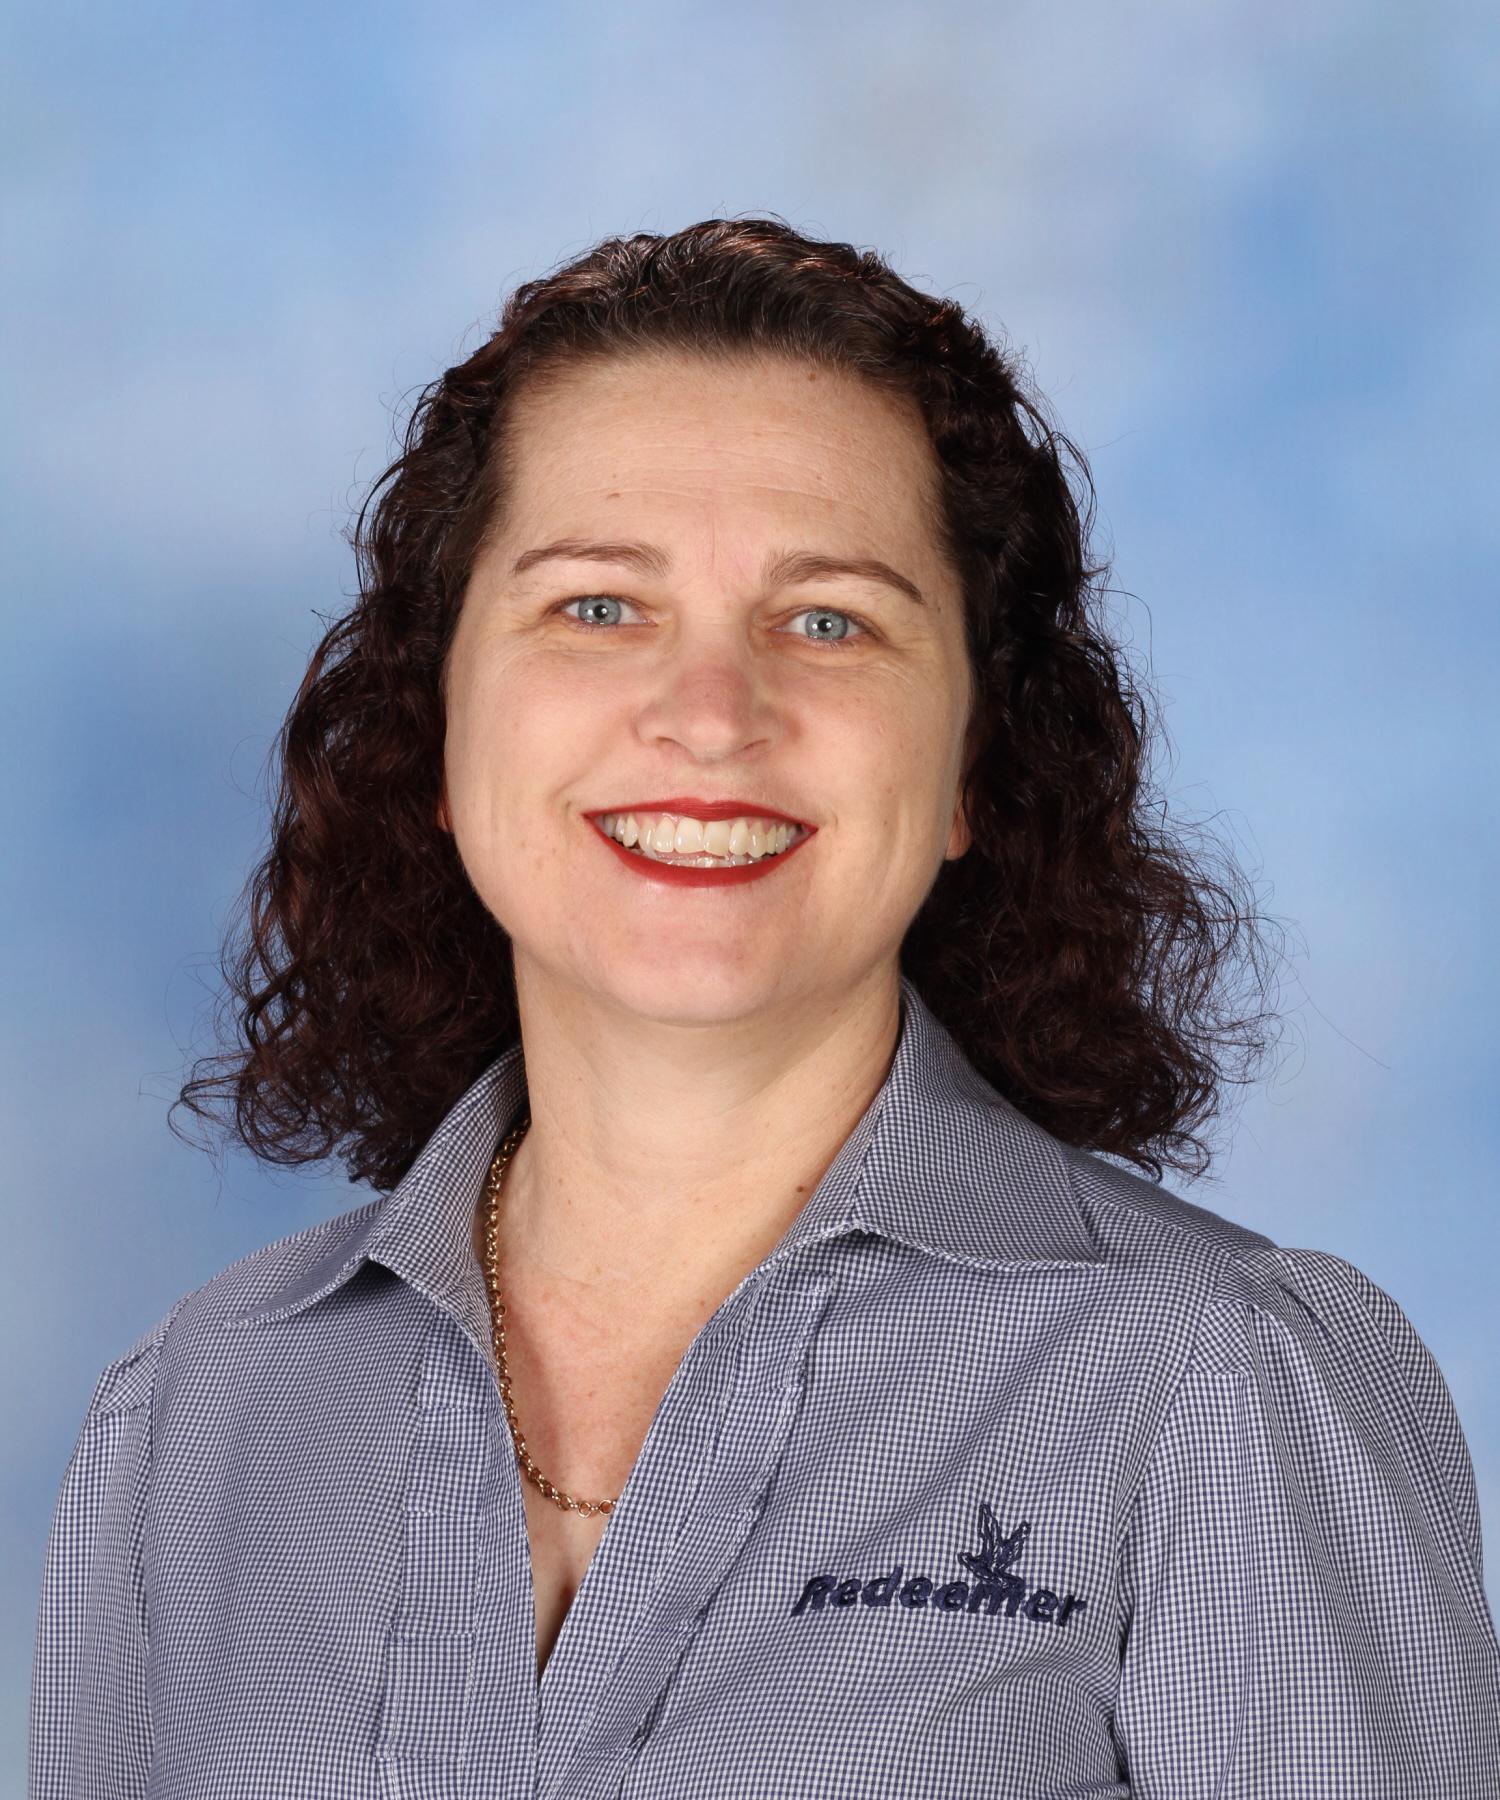 Mrs Petrea Jensen